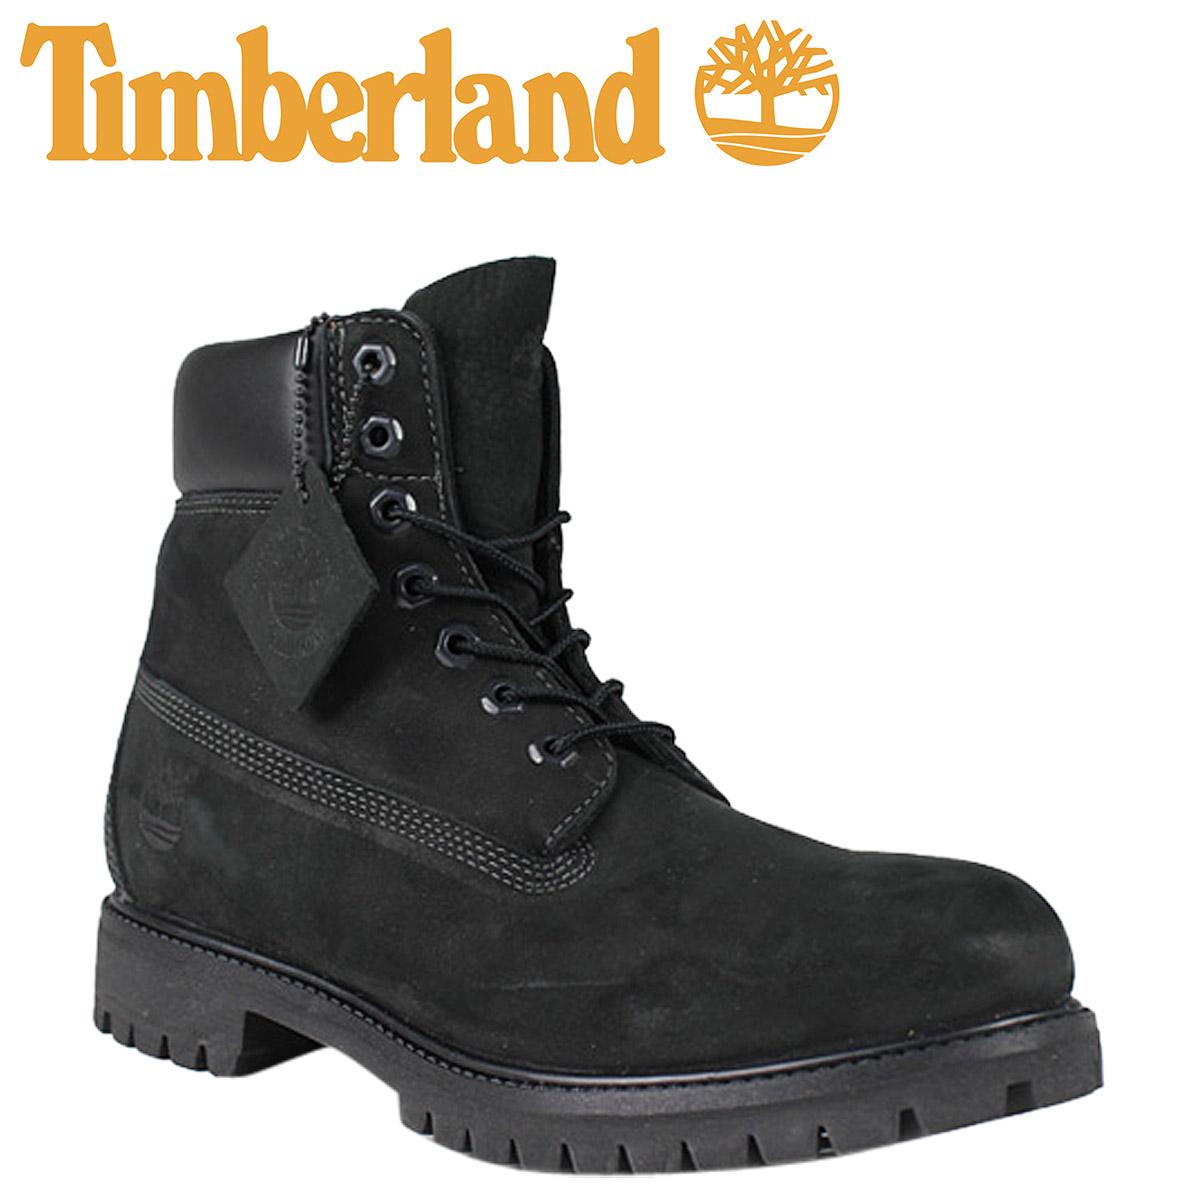 Timberland Timberland 6 inch premium waterproof boot rust nubuck mens boots Black  Nubuck 1f9b7d17abab